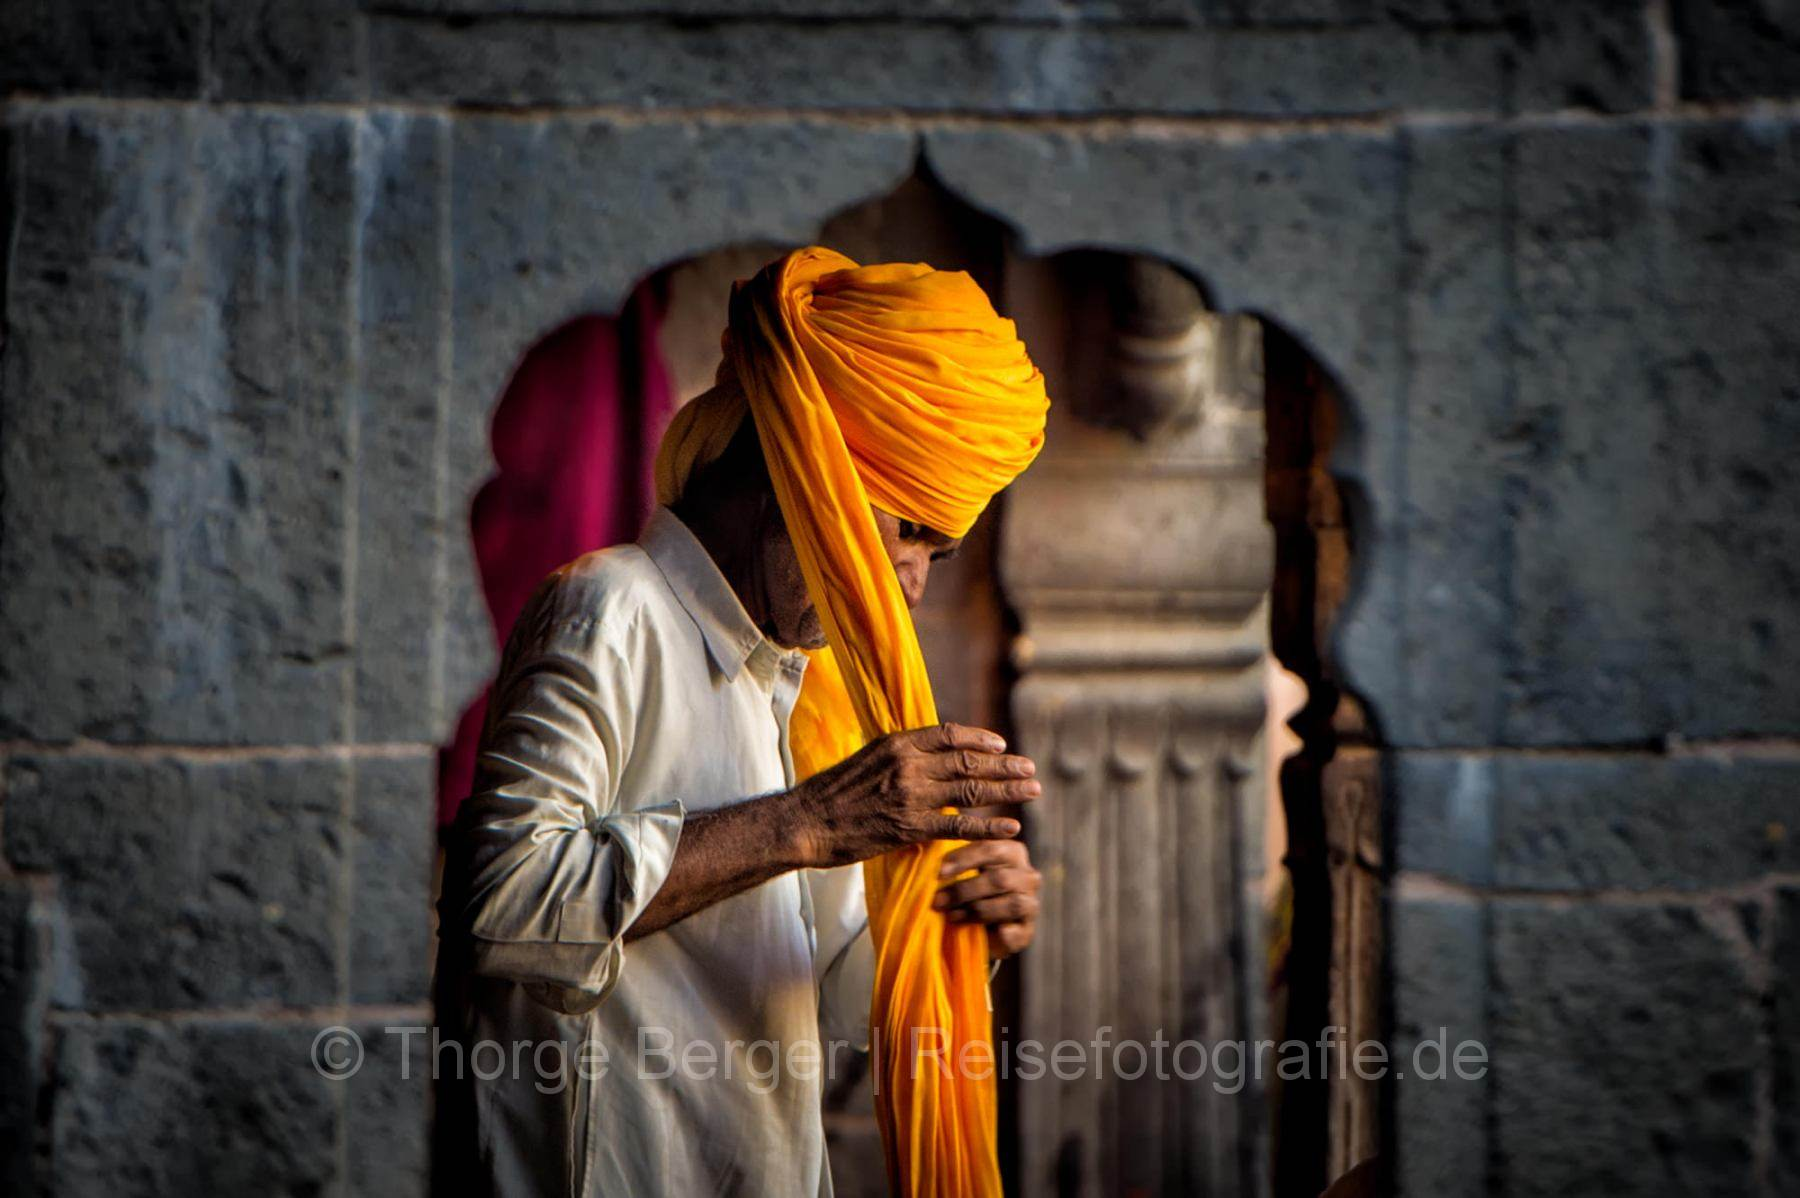 Turban dressing